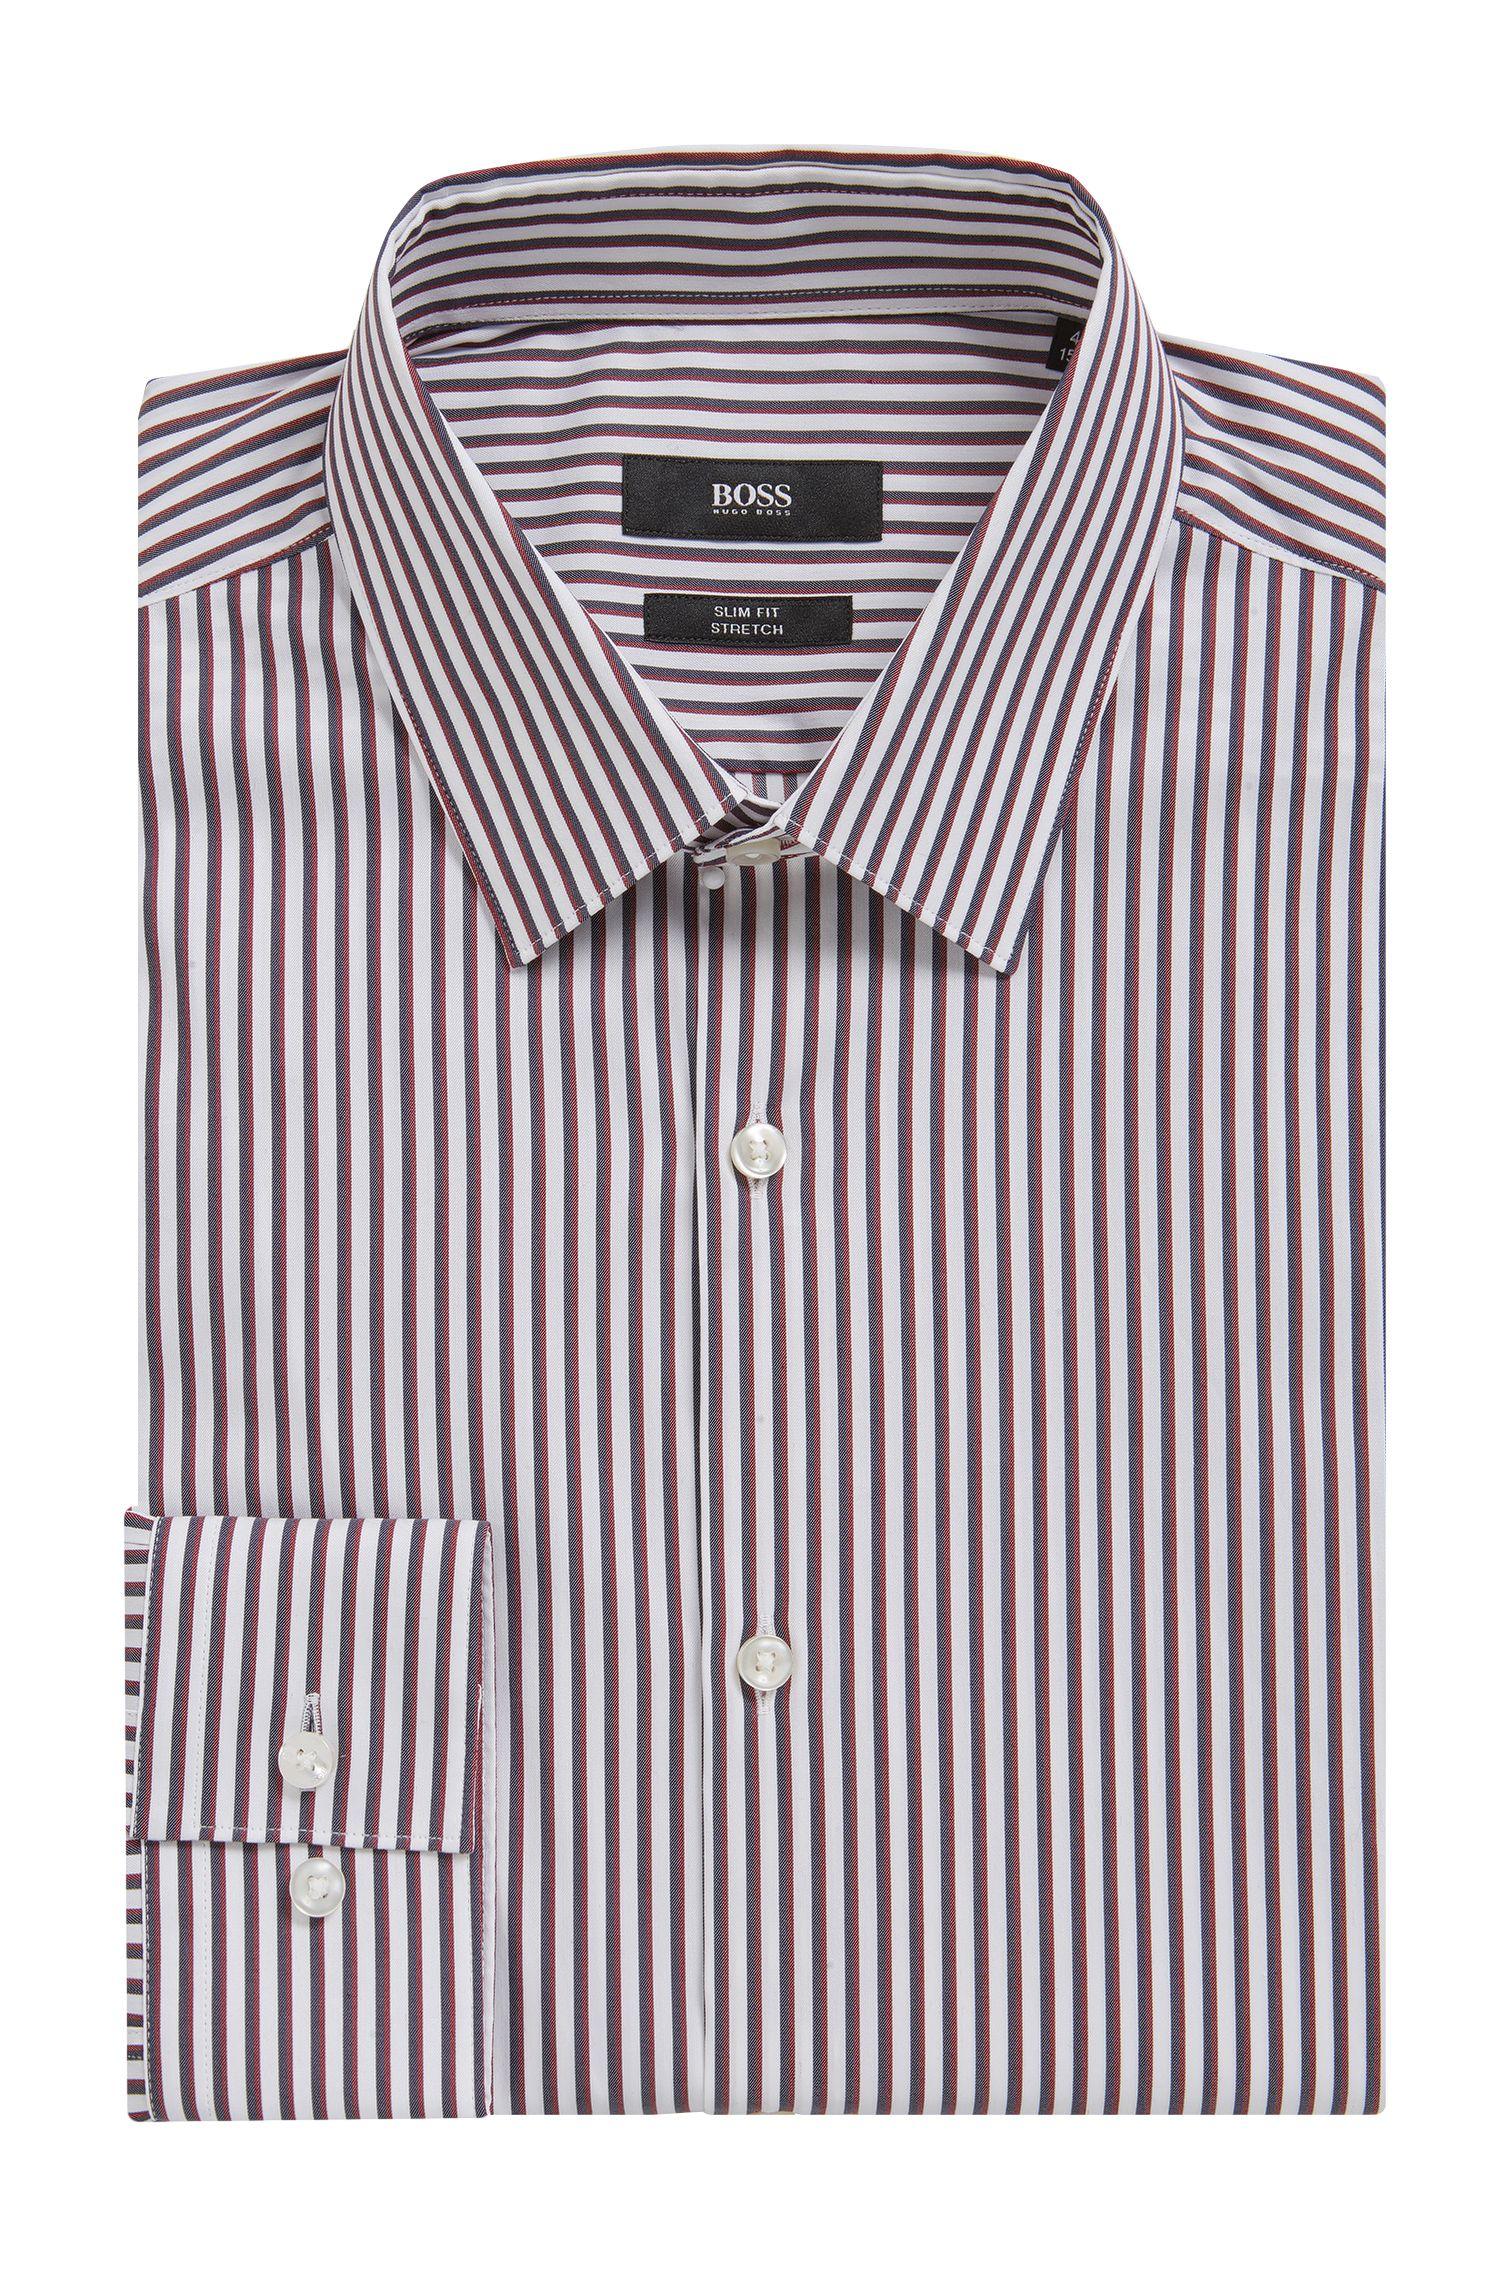 'Isko' | Slim Fit, Striped Stretch Cotton Dress Shirt